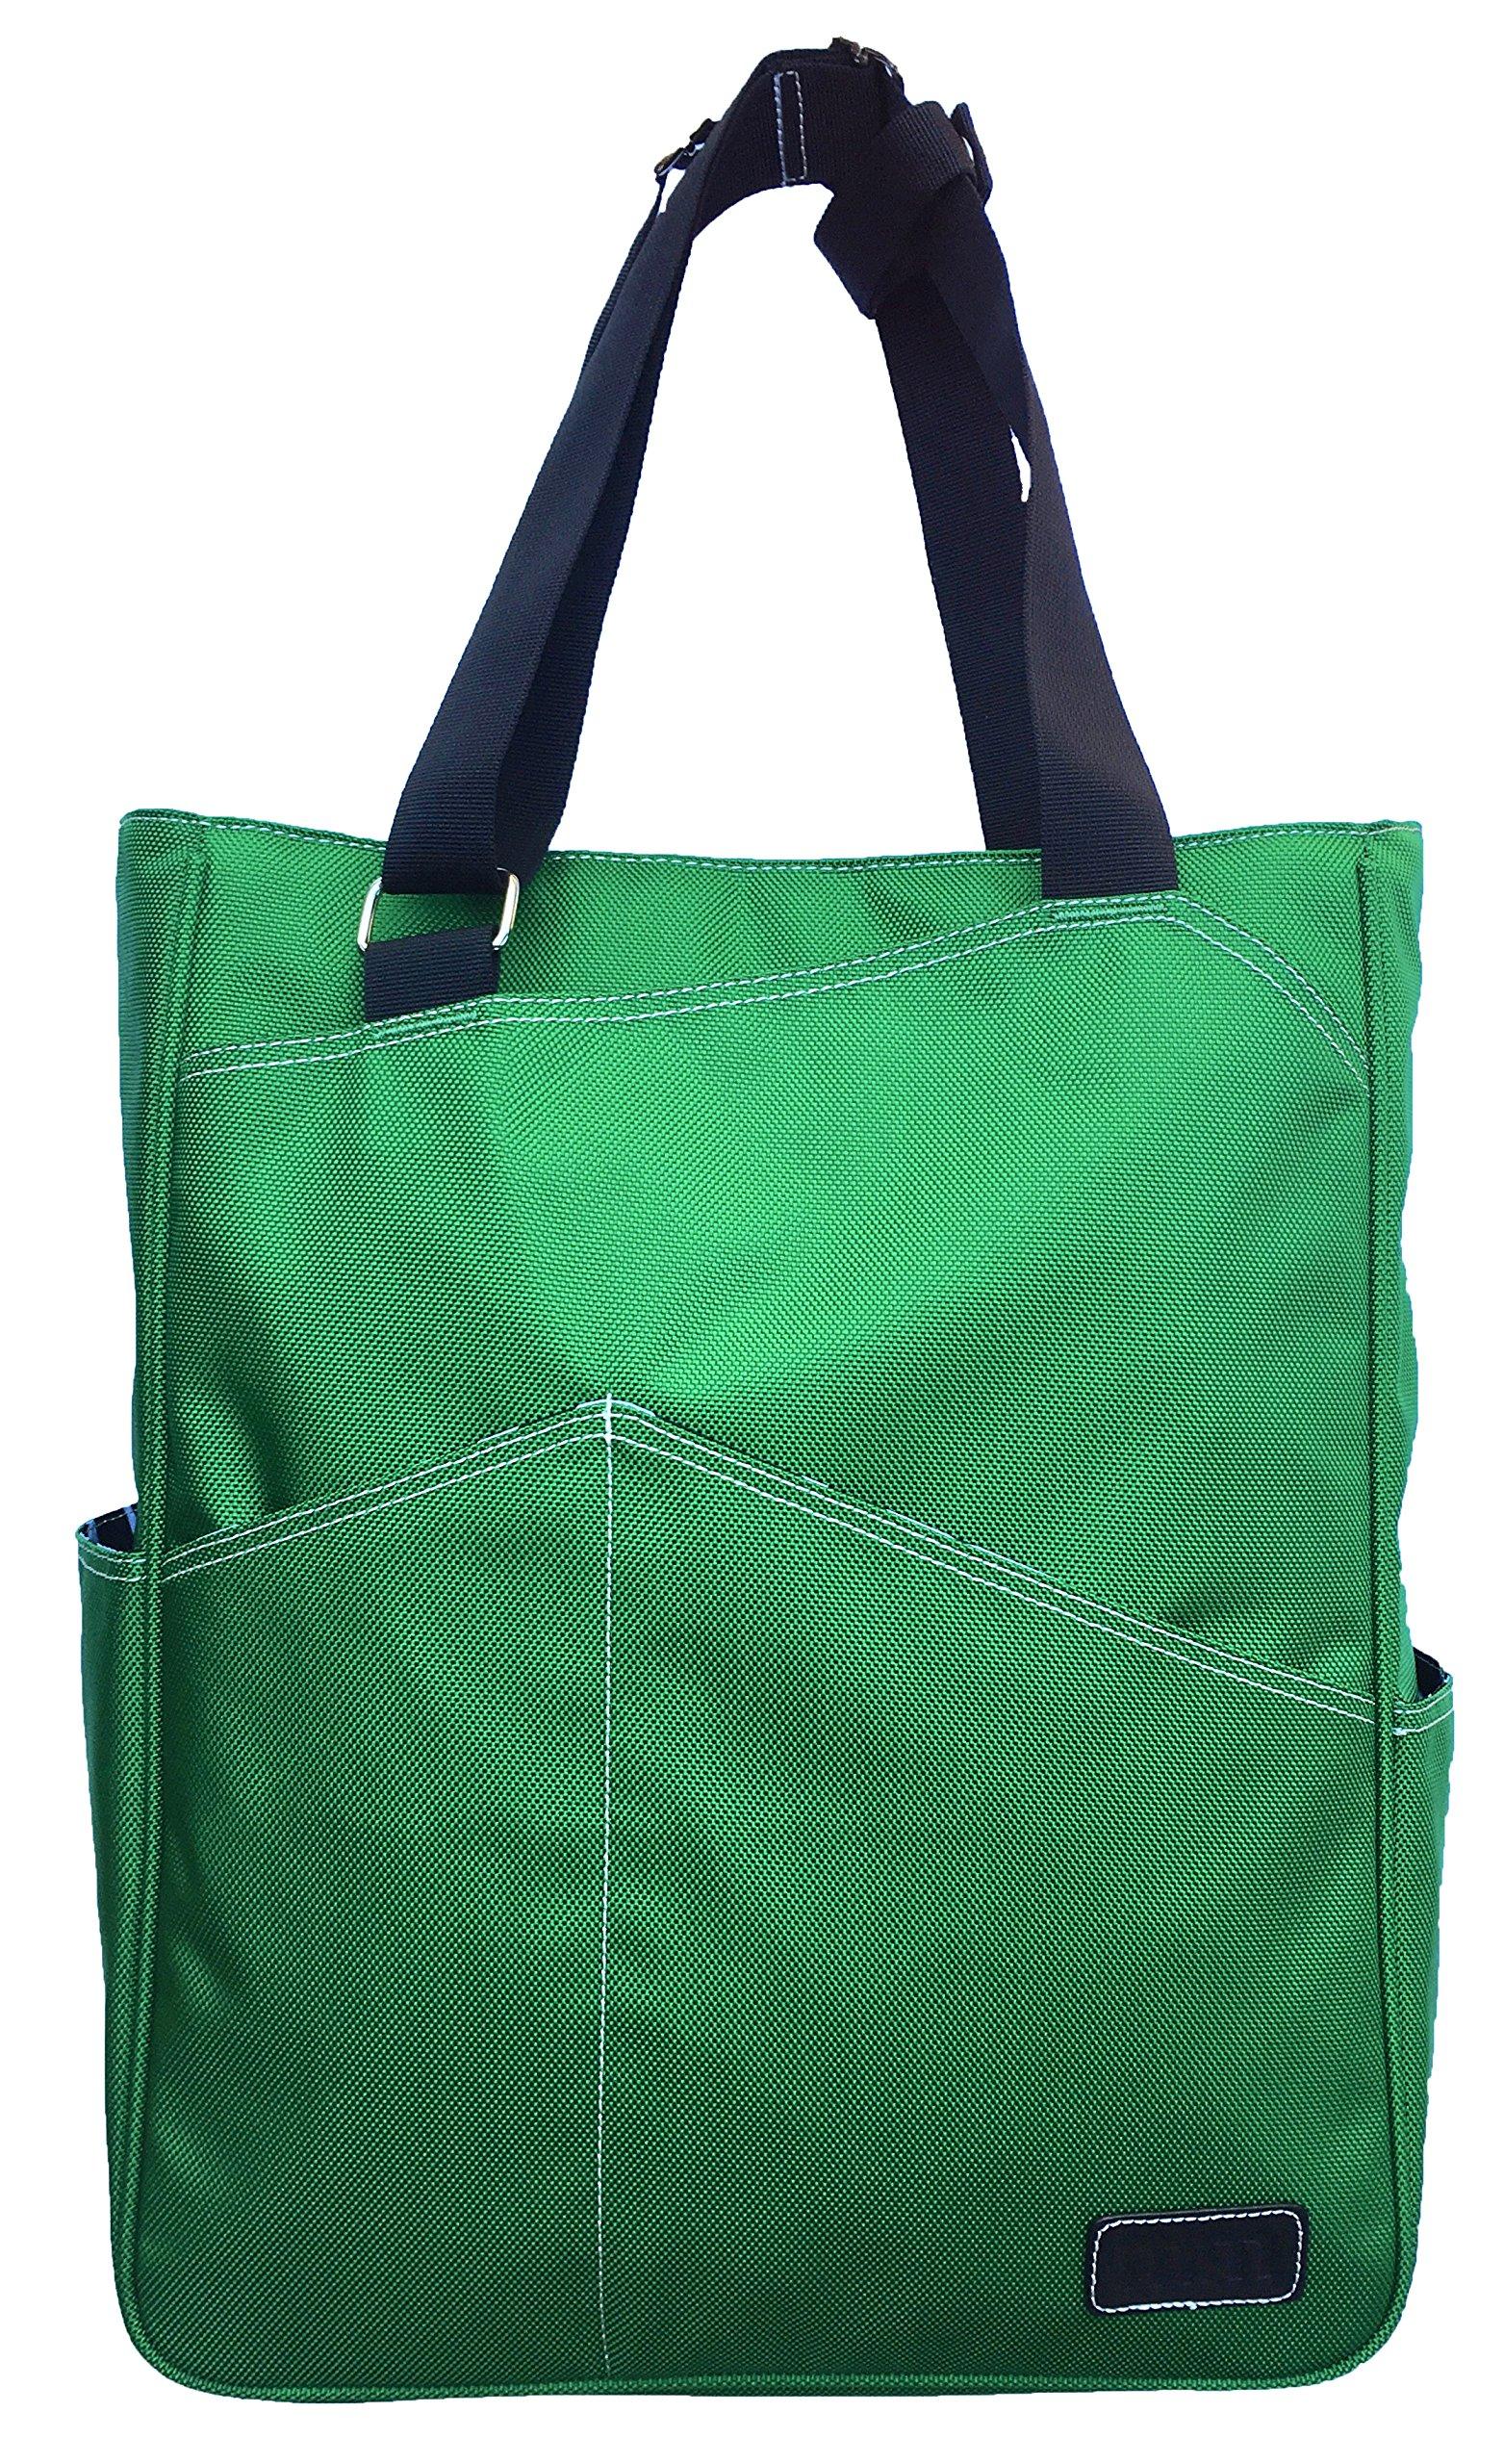 Maggie Mather Tennis Tote, Travel Tote (Emerald) New Zipper Closure